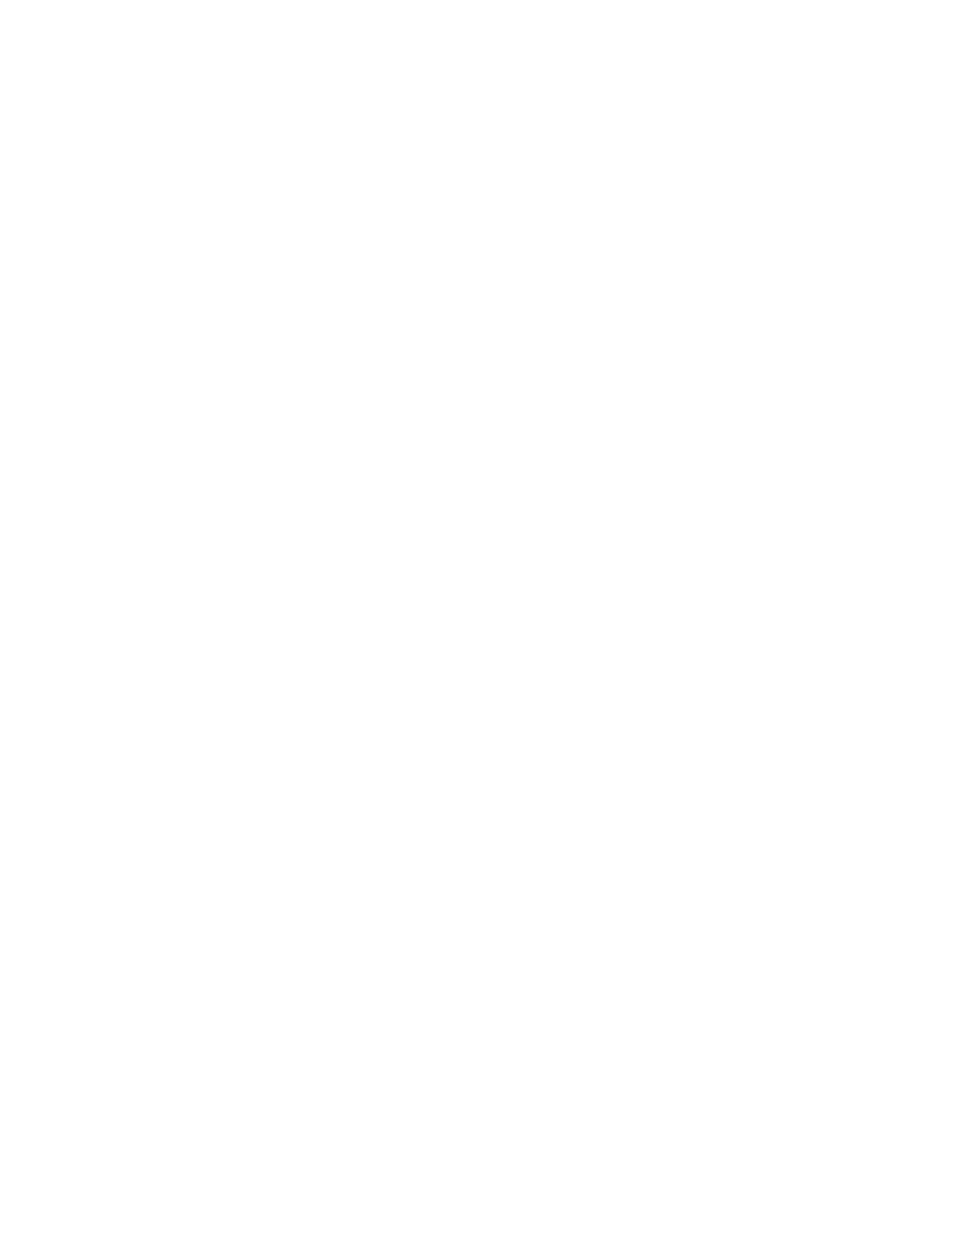 Peterson iStroboSoft User Manual   Page 2 / 6